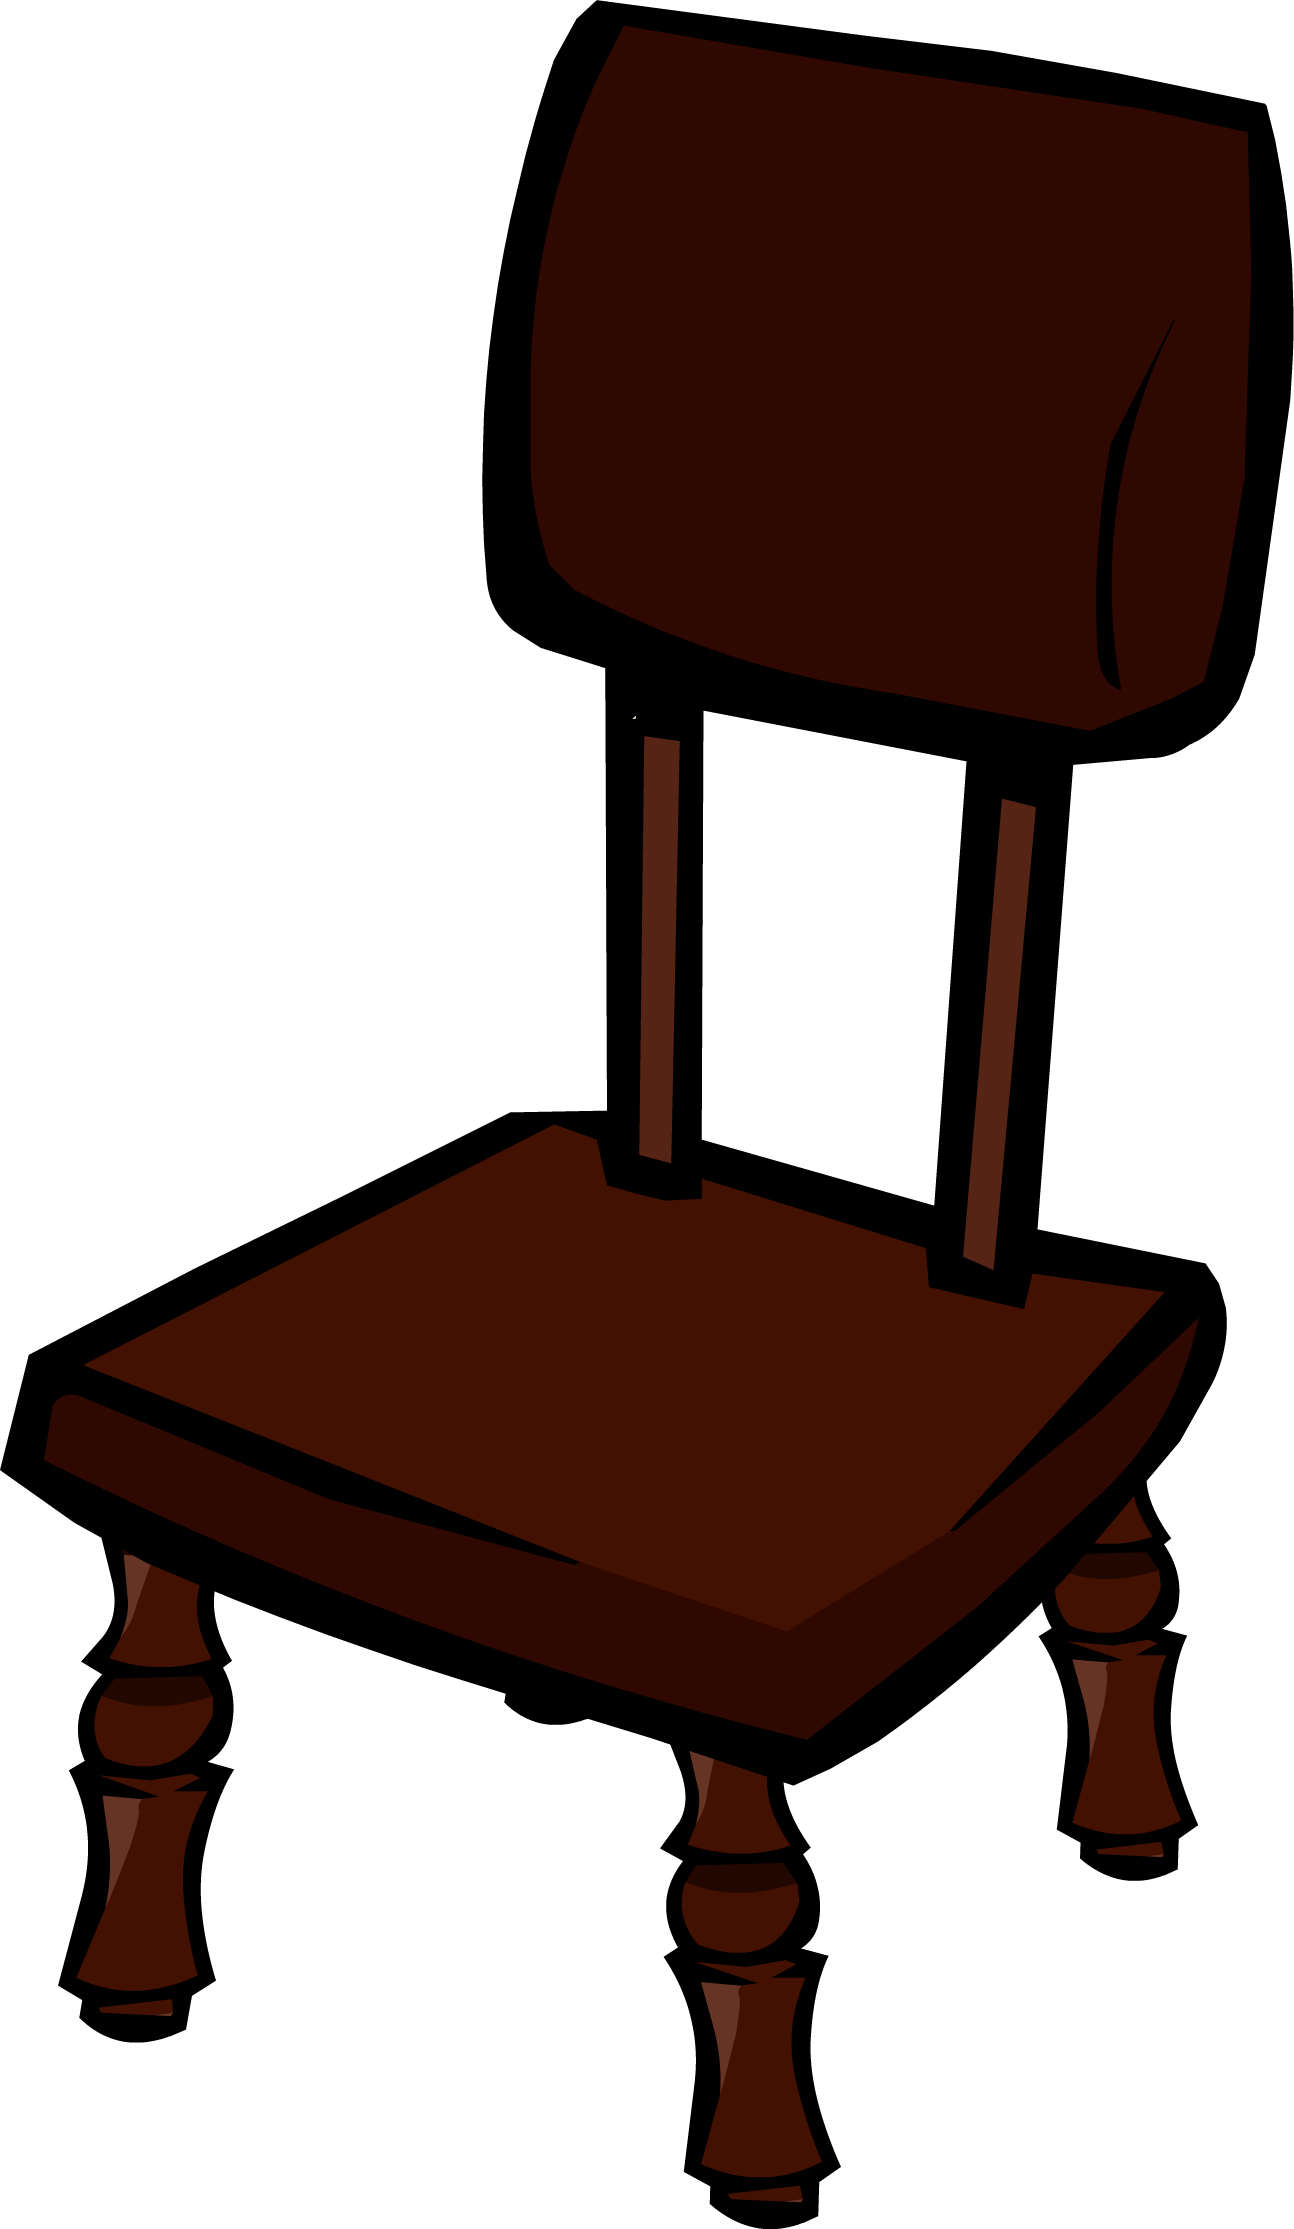 rosewood chair club penguin wiki fandom powered by wikia rh clubpenguin wikia com